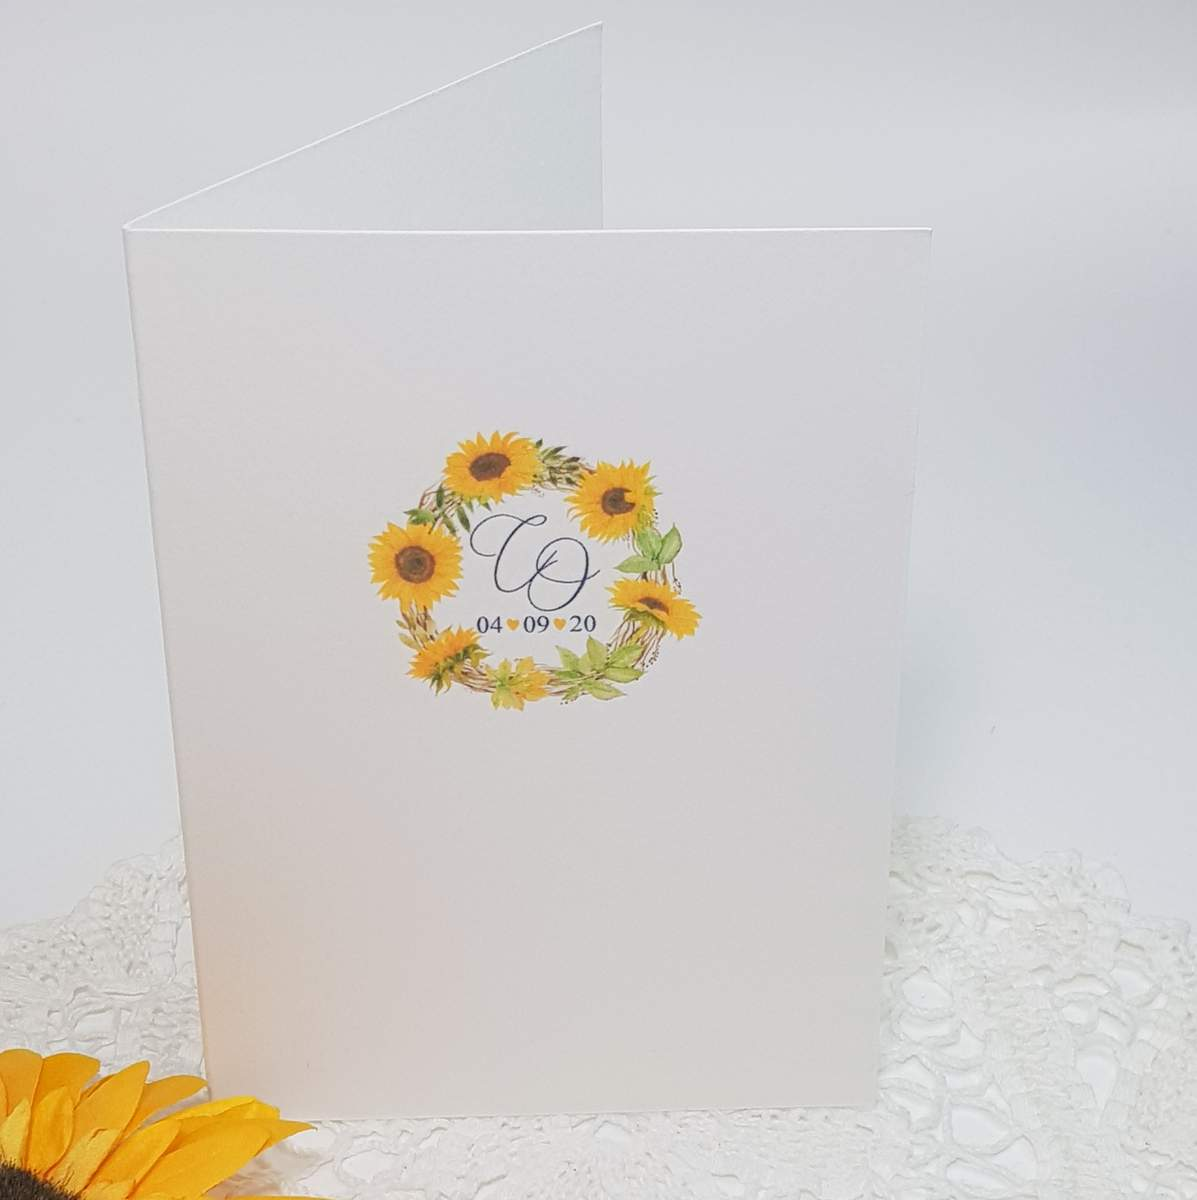 Wedding program booklet with a yellow sunflower wreath design